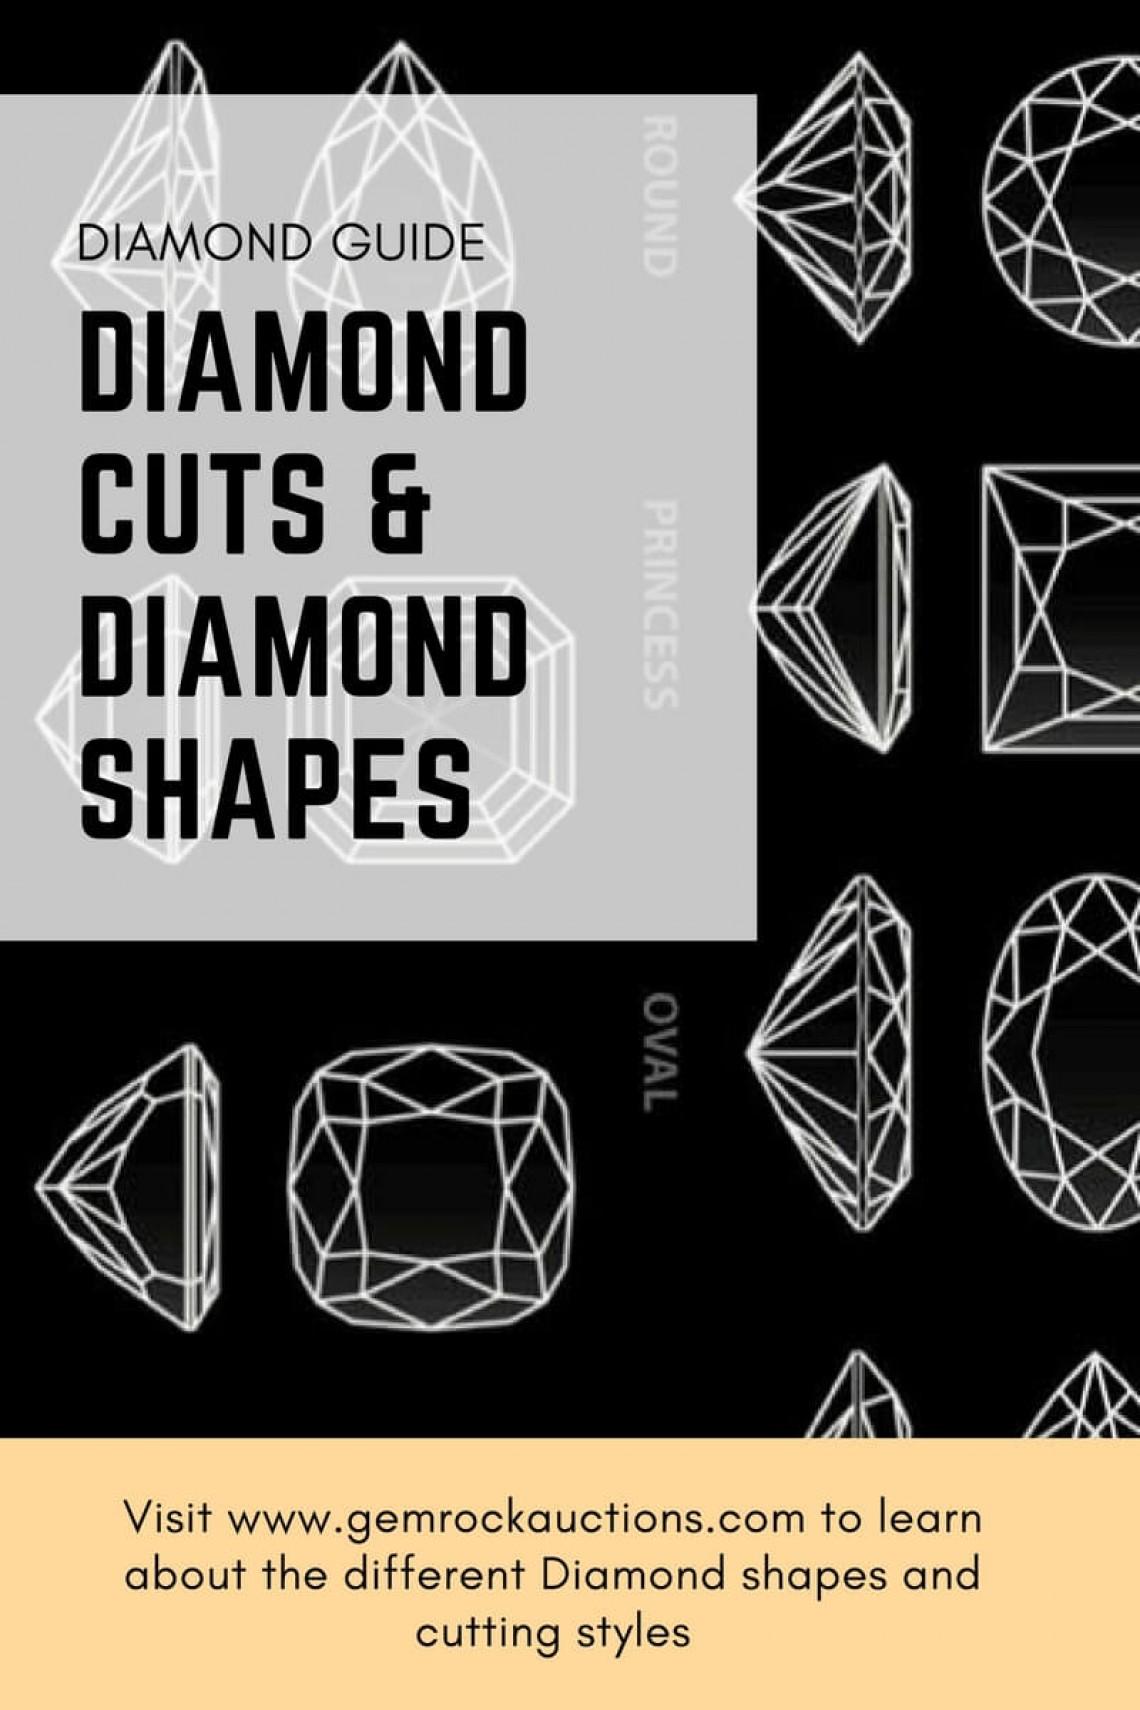 Diamond Cuts and Diamond Shapes